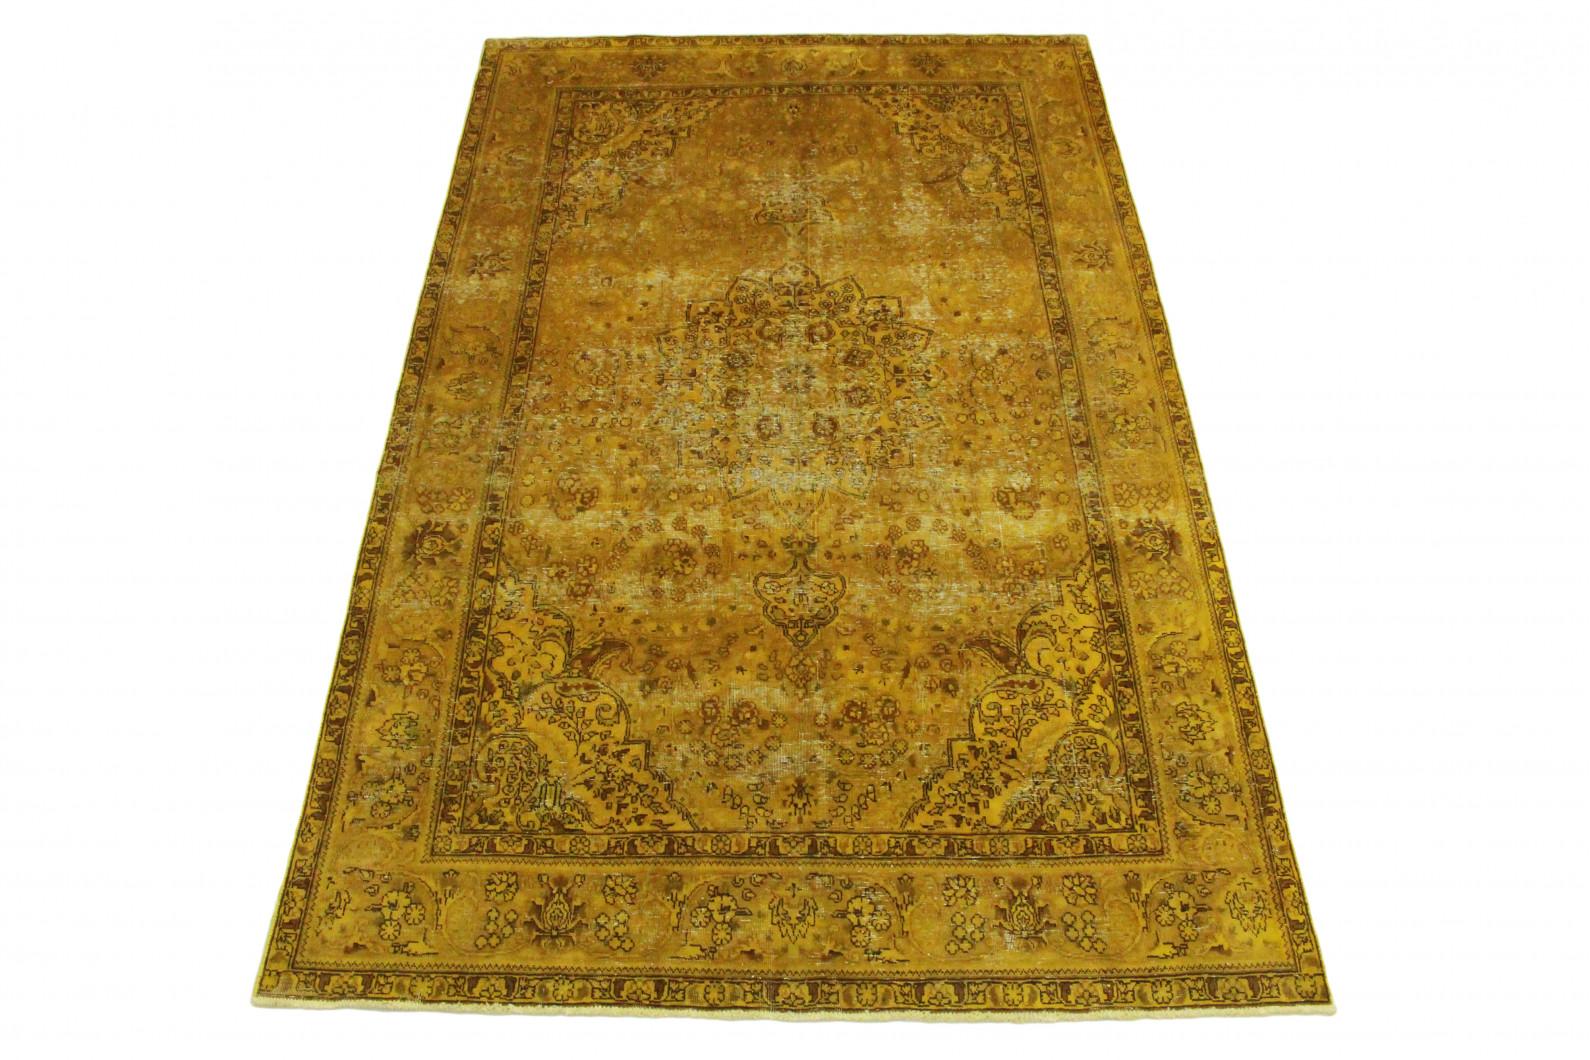 vintage teppich gold gelb in 310x200 1001 3493 bei. Black Bedroom Furniture Sets. Home Design Ideas